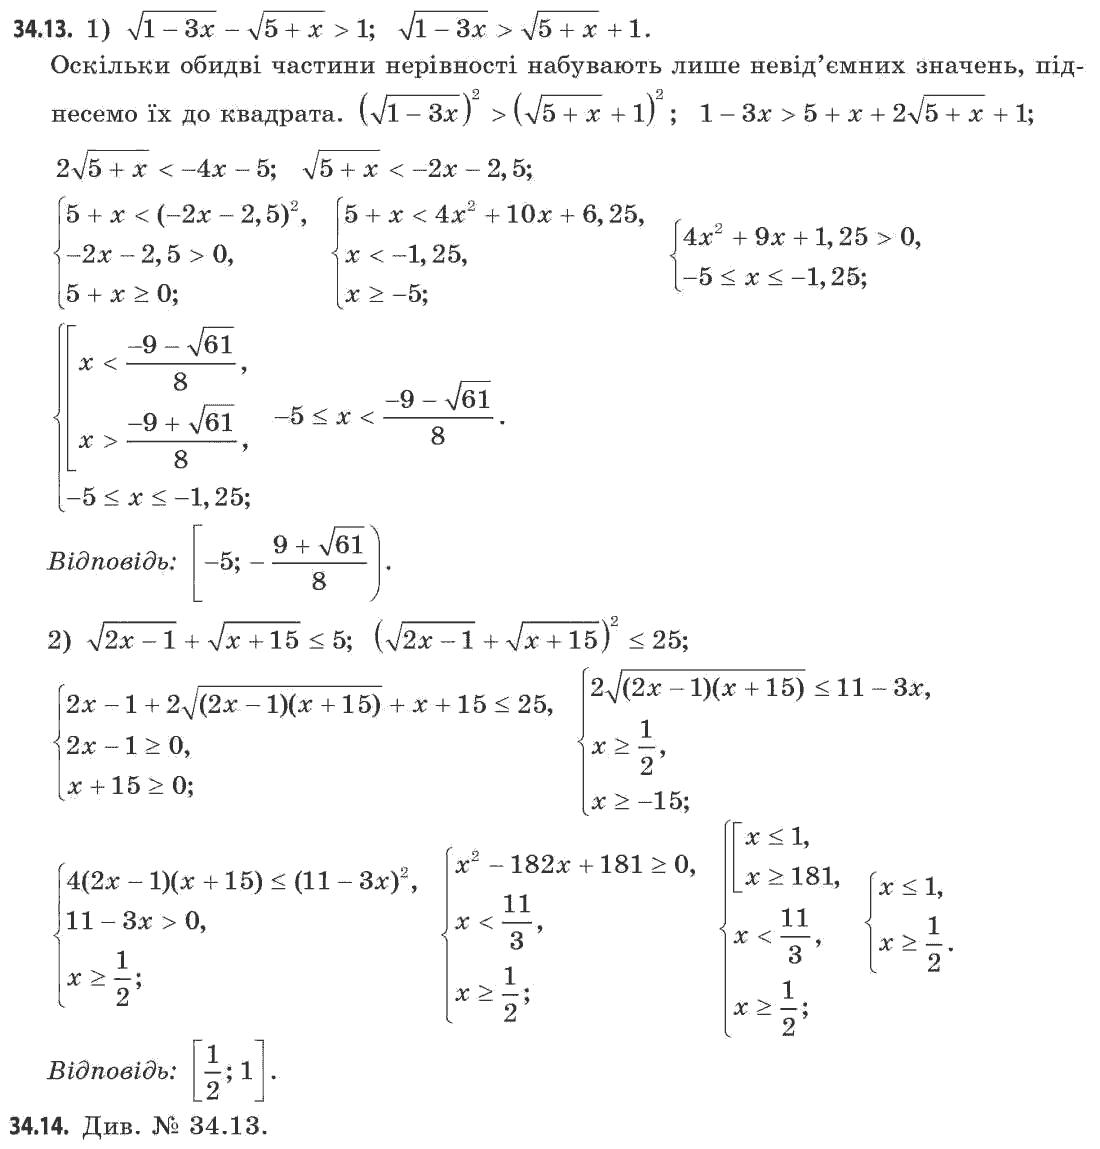 алгебра профільний рівень а.г. мерзляк гдз